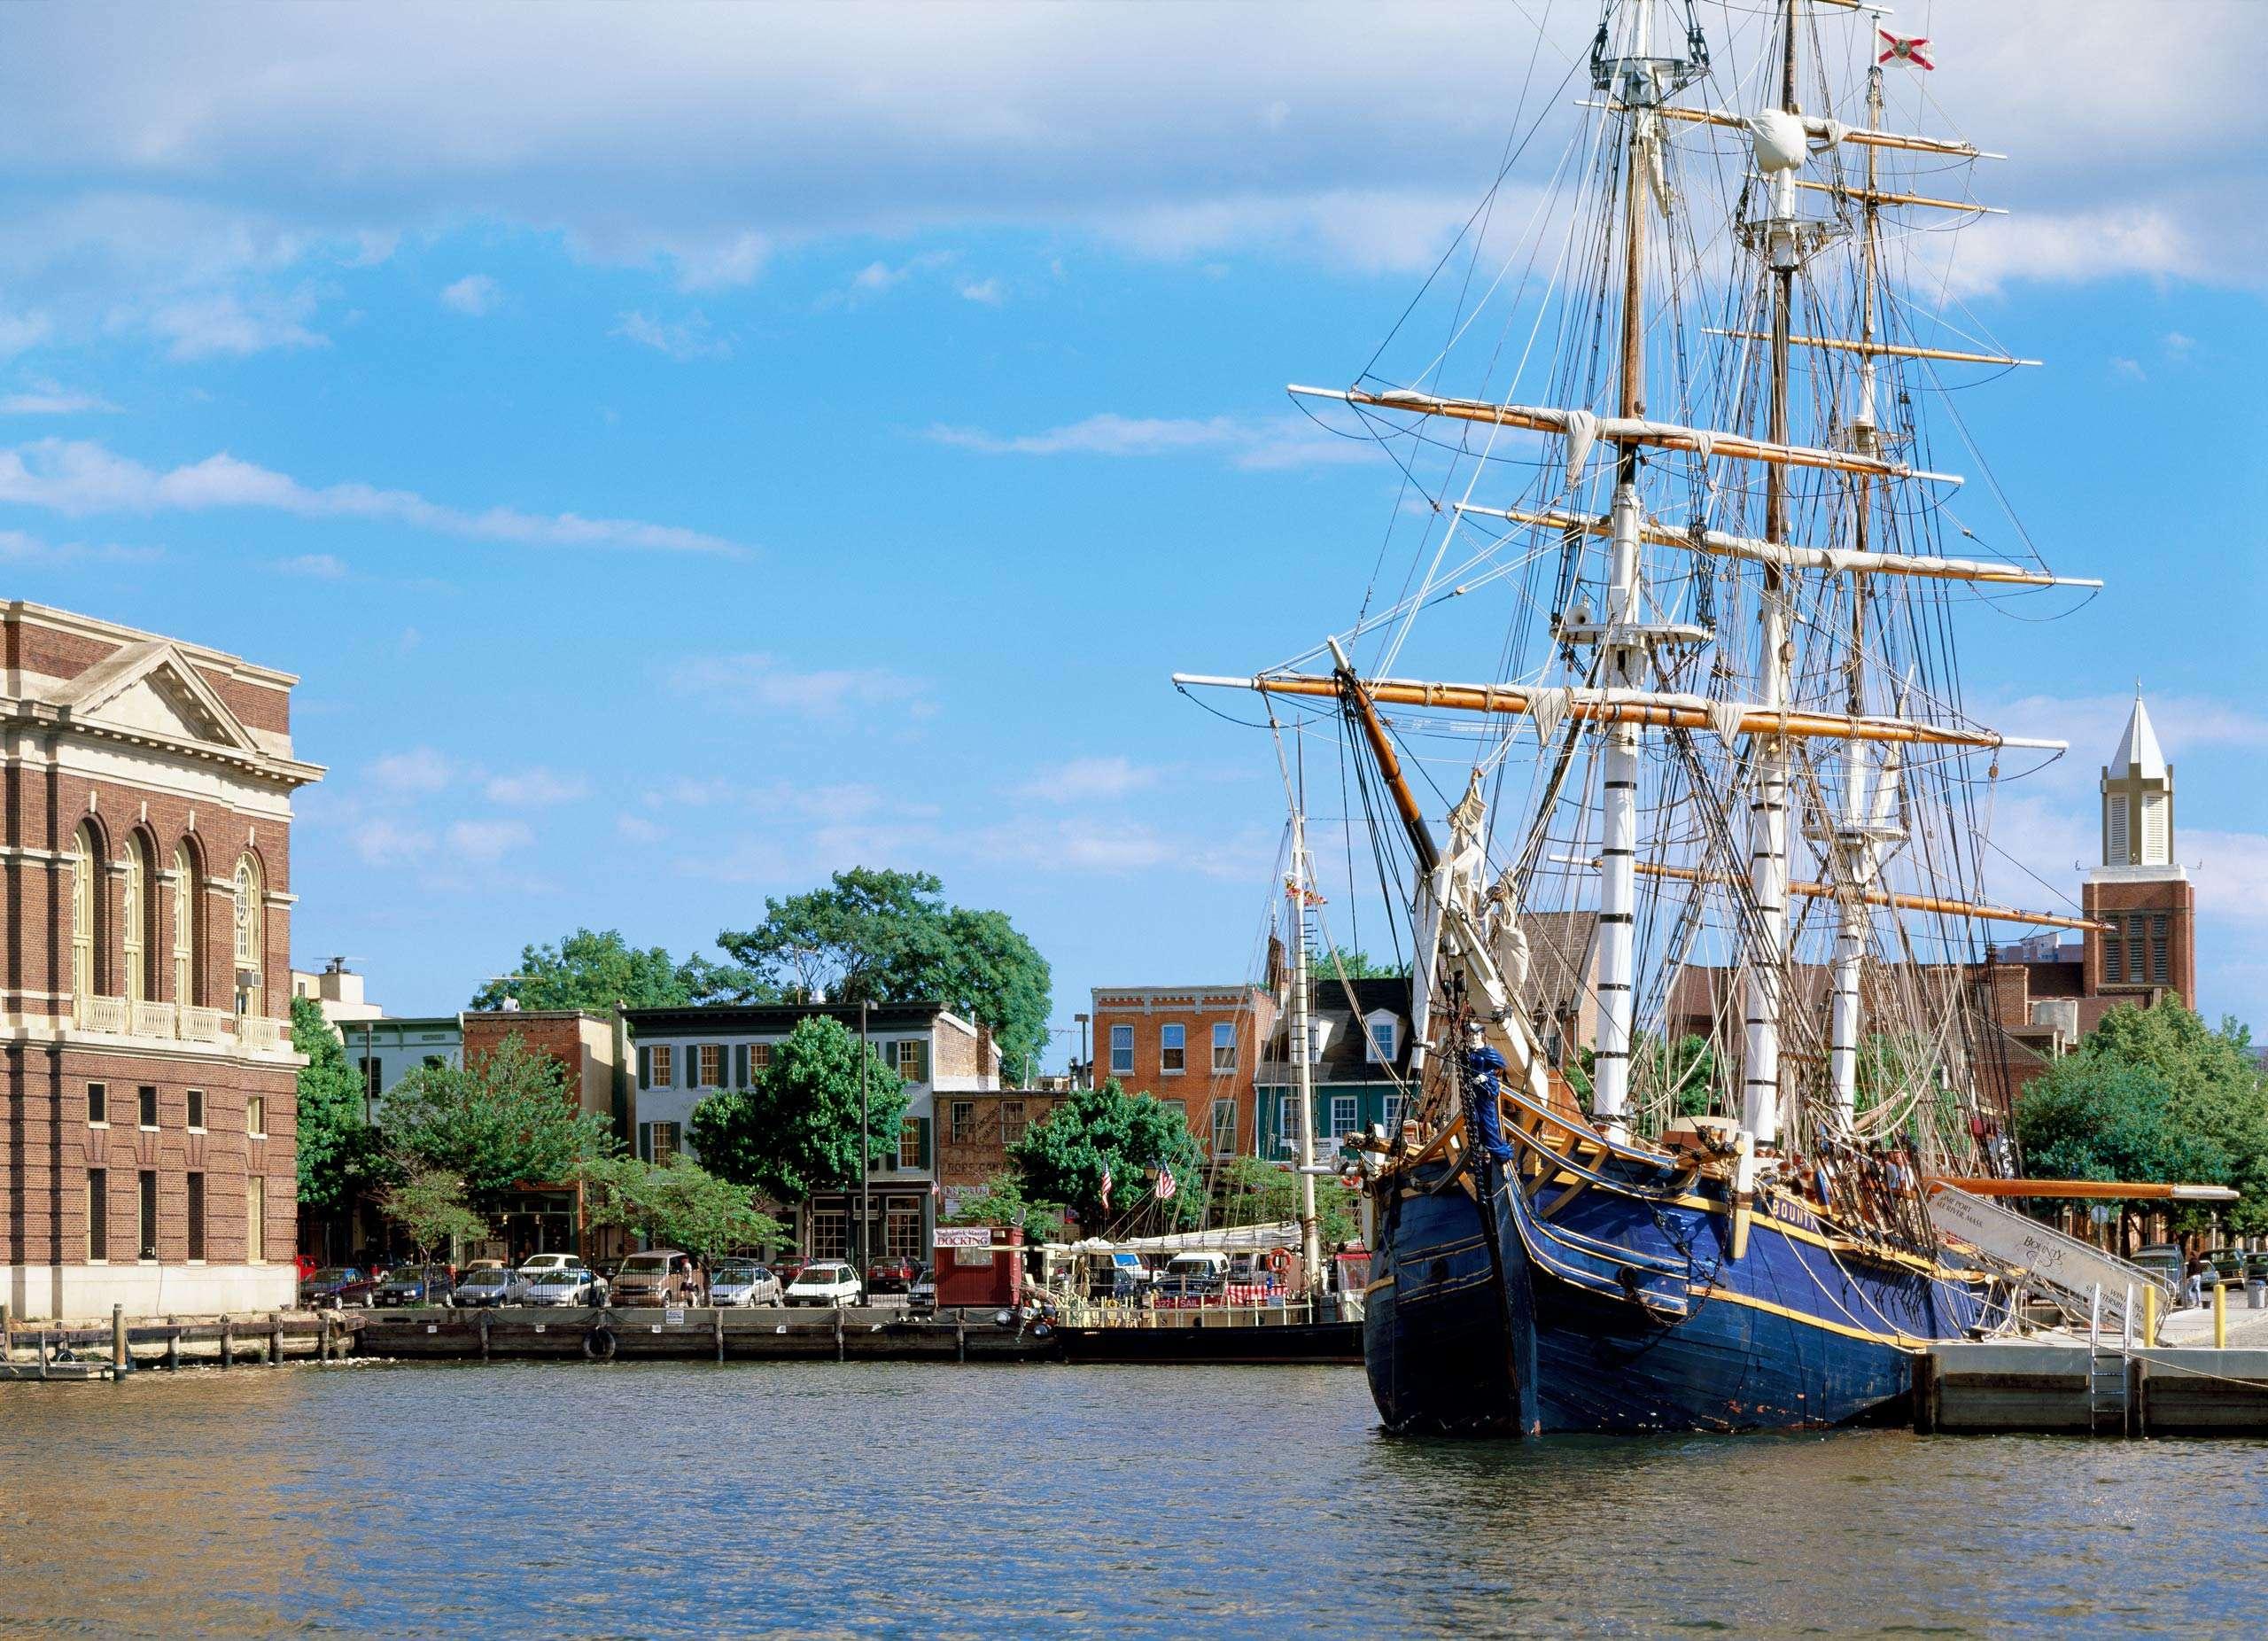 PORTFOLIO - Baltimore - Neighborhoods   #22   Tall Ship Docked in Fells Point Baltimore